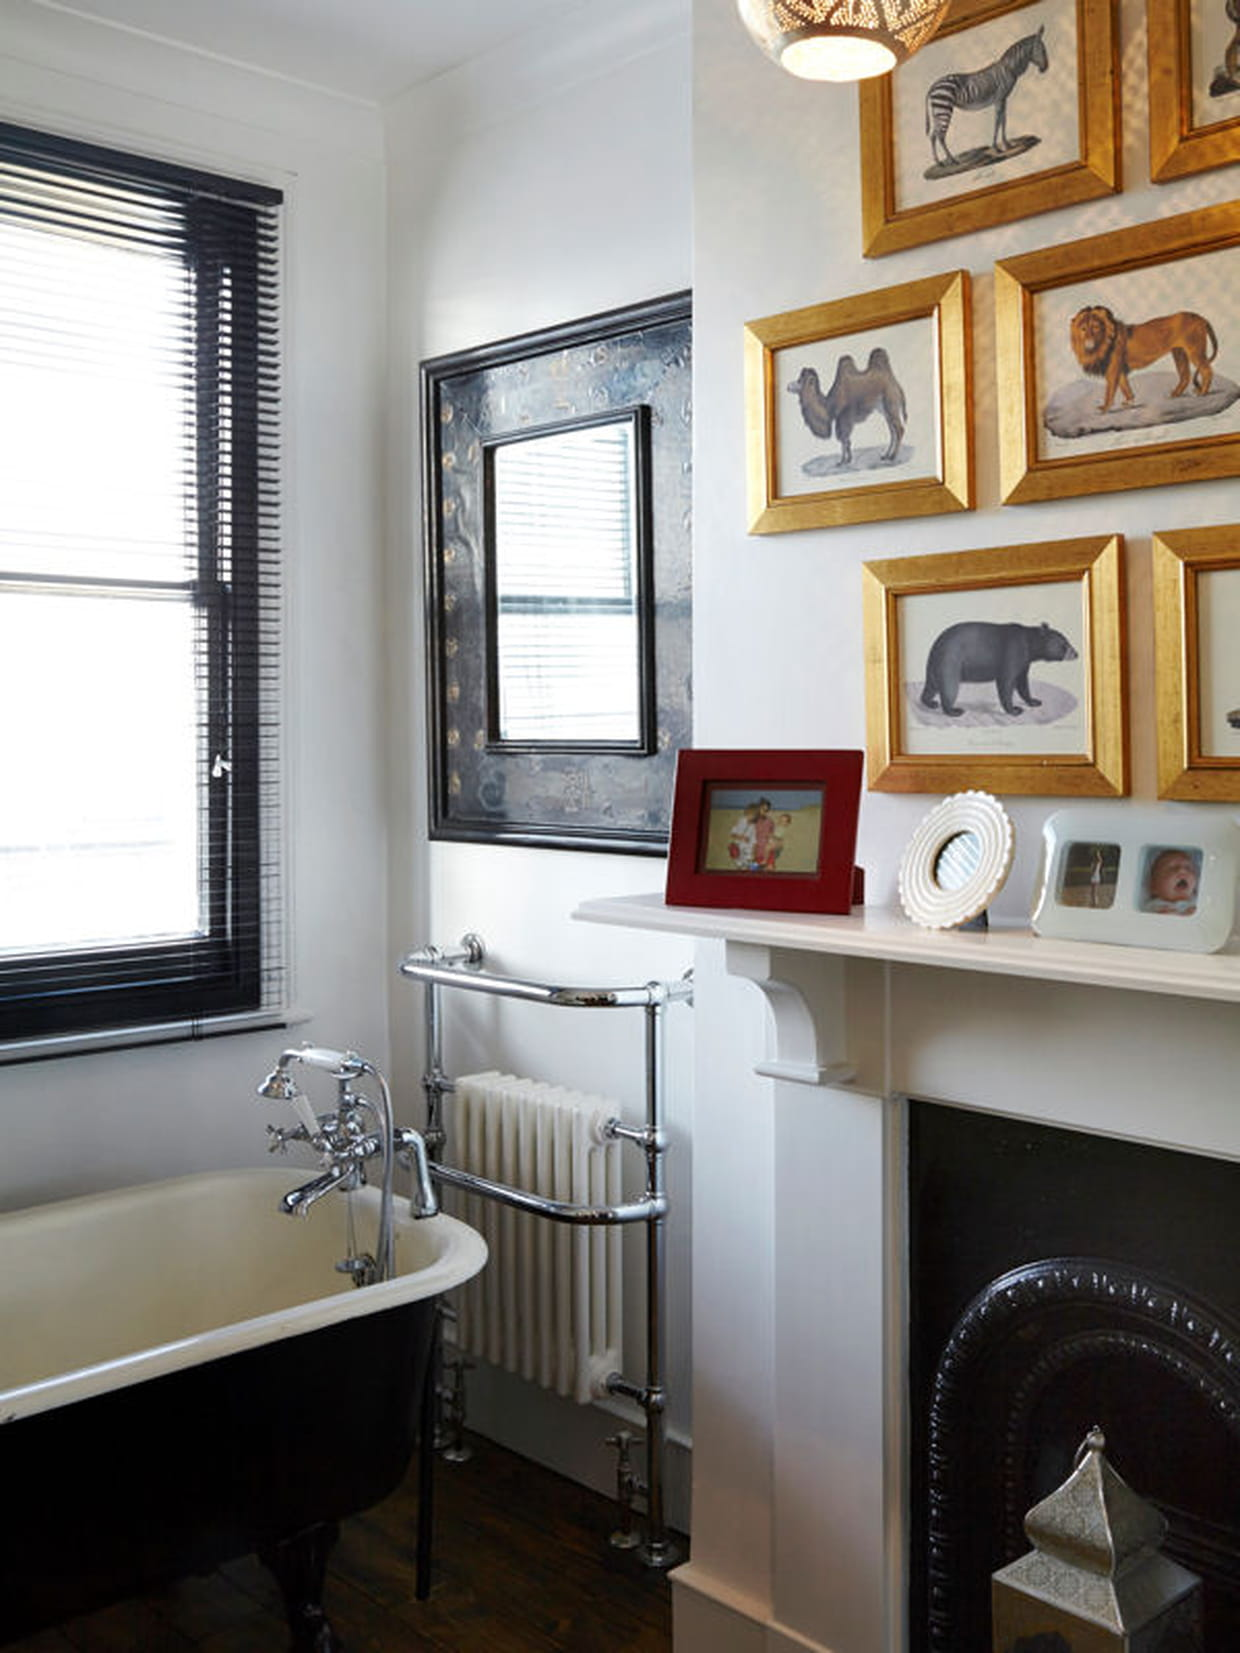 voyage depuis la baignoire. Black Bedroom Furniture Sets. Home Design Ideas